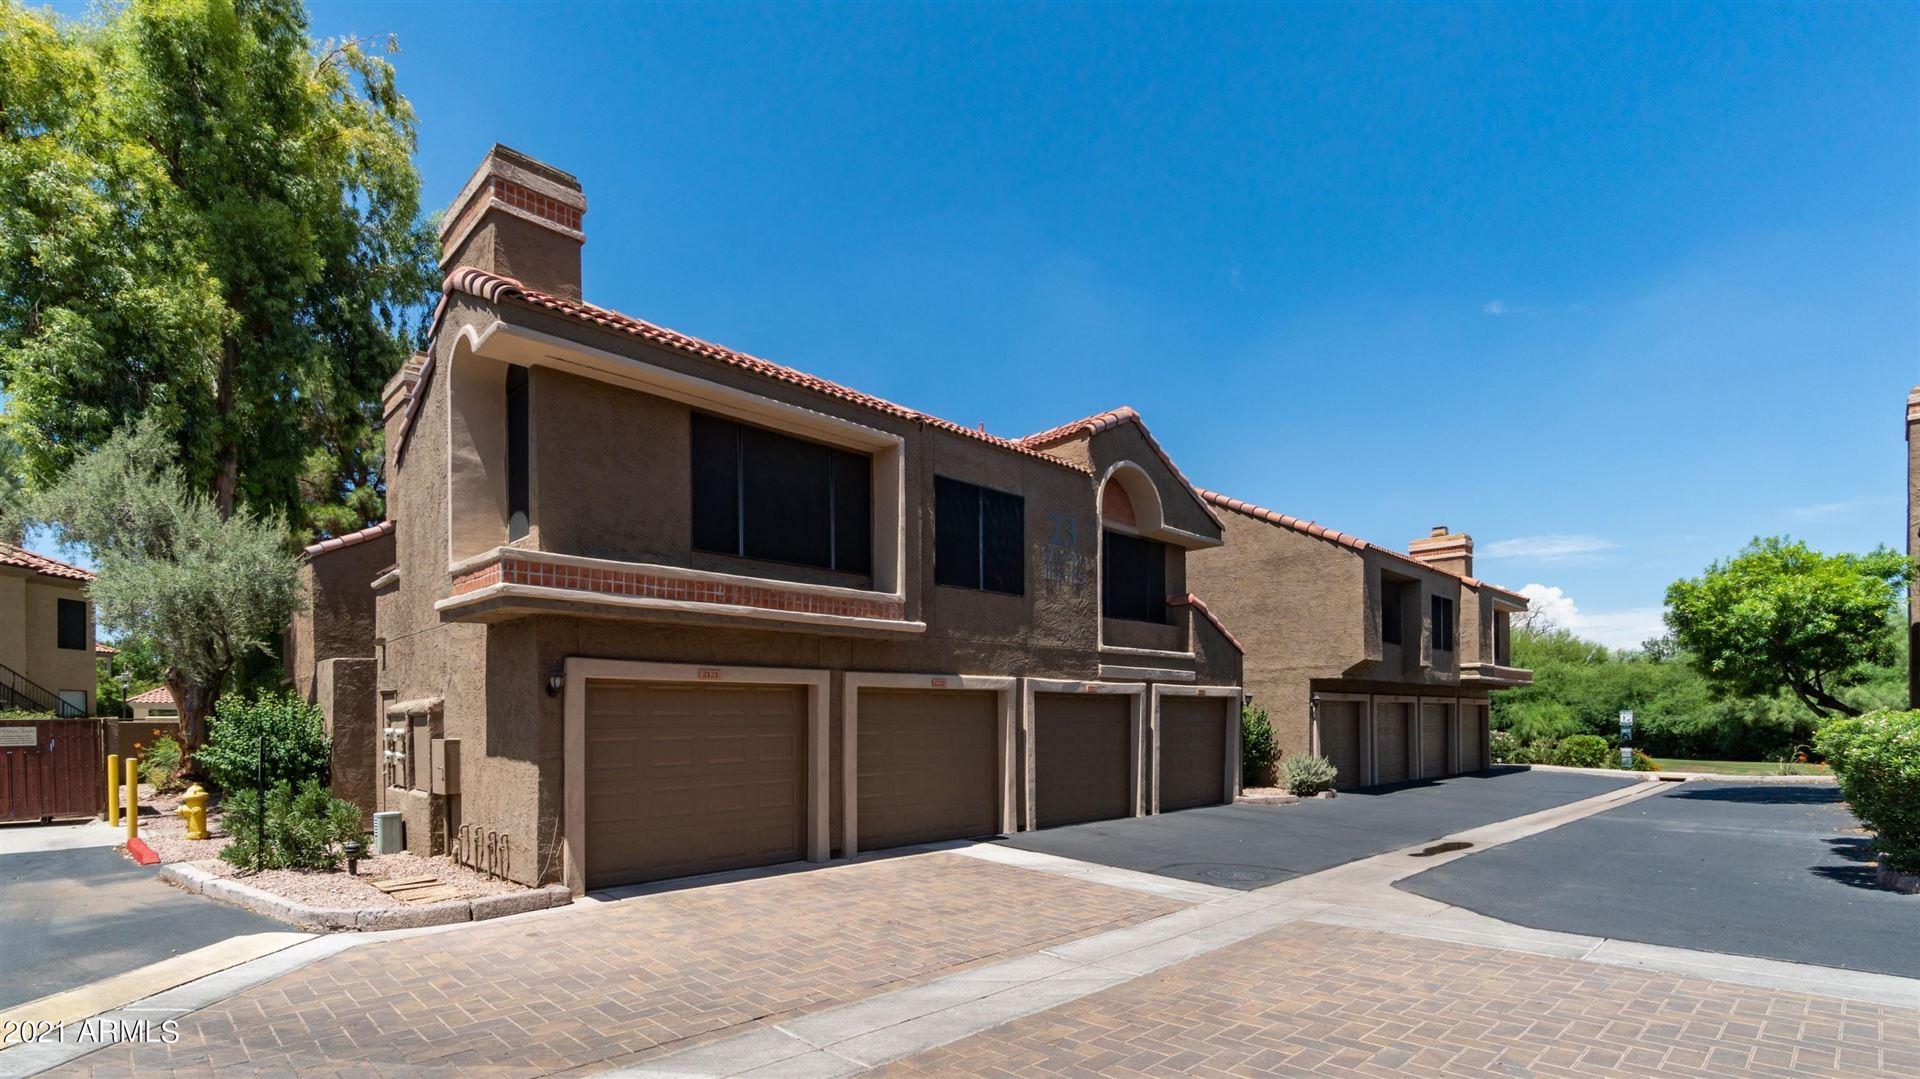 Photo of 5122 E SHEA Boulevard #1122, Scottsdale, AZ 85254 (MLS # 6272533)